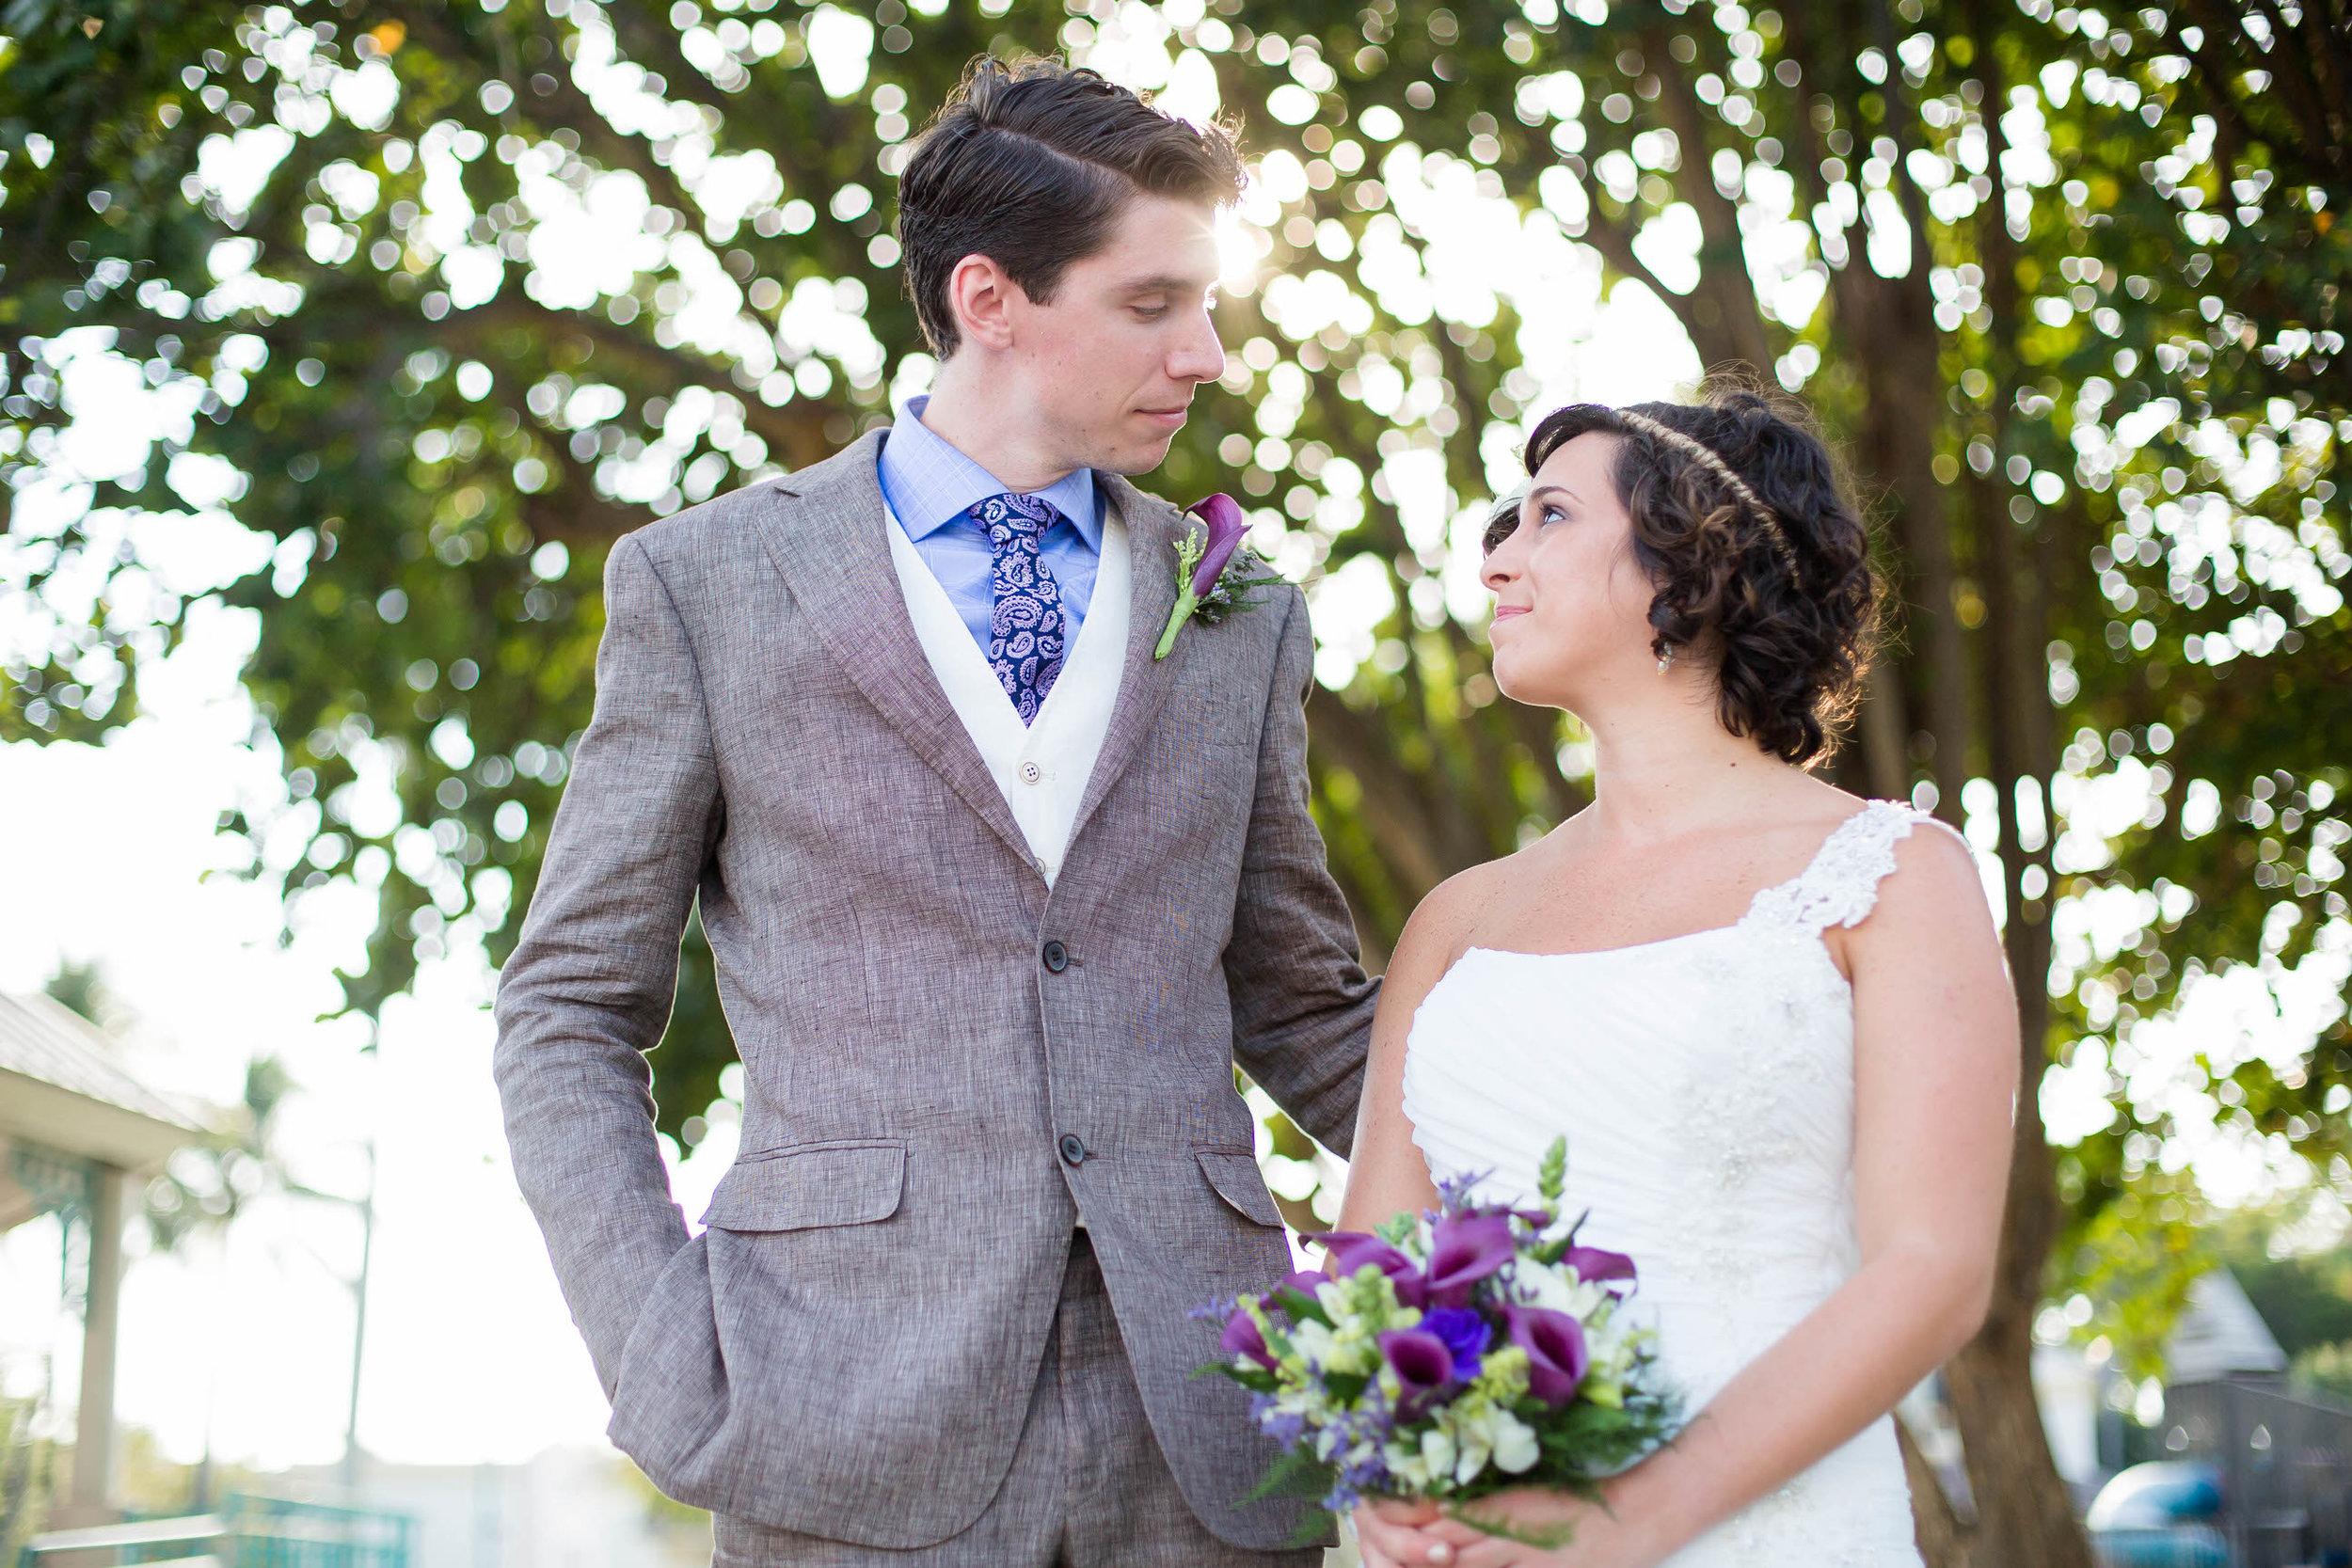 bride-groom-wedding-portraits-delray-florida-tiny-house-photo.jpg